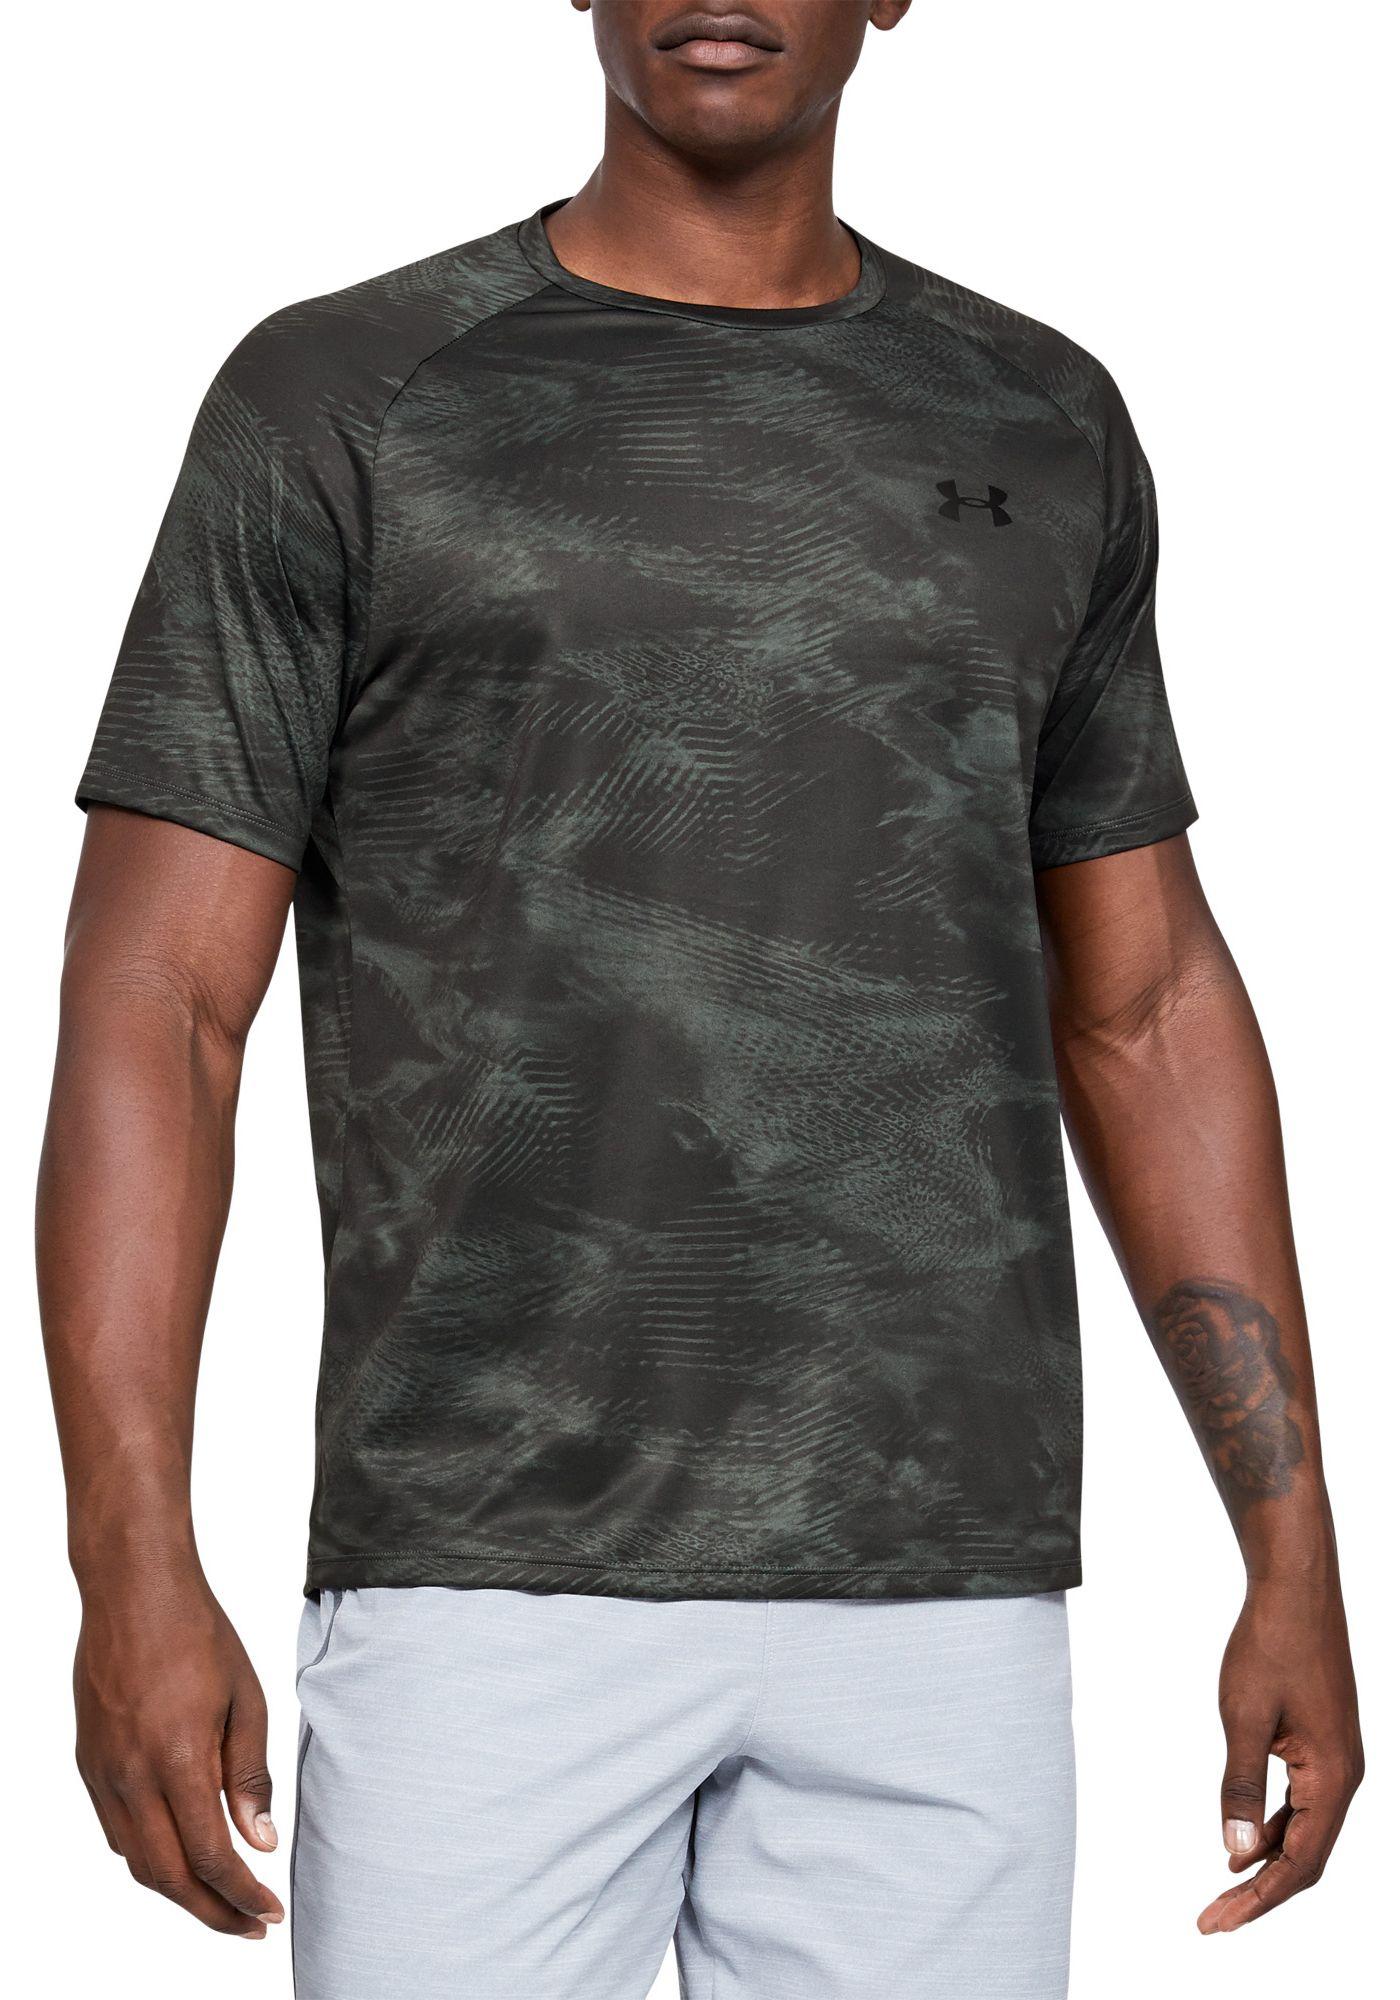 Under Armour Men's UA Tech Printed T-Shirt (Regular and Big & Tall)